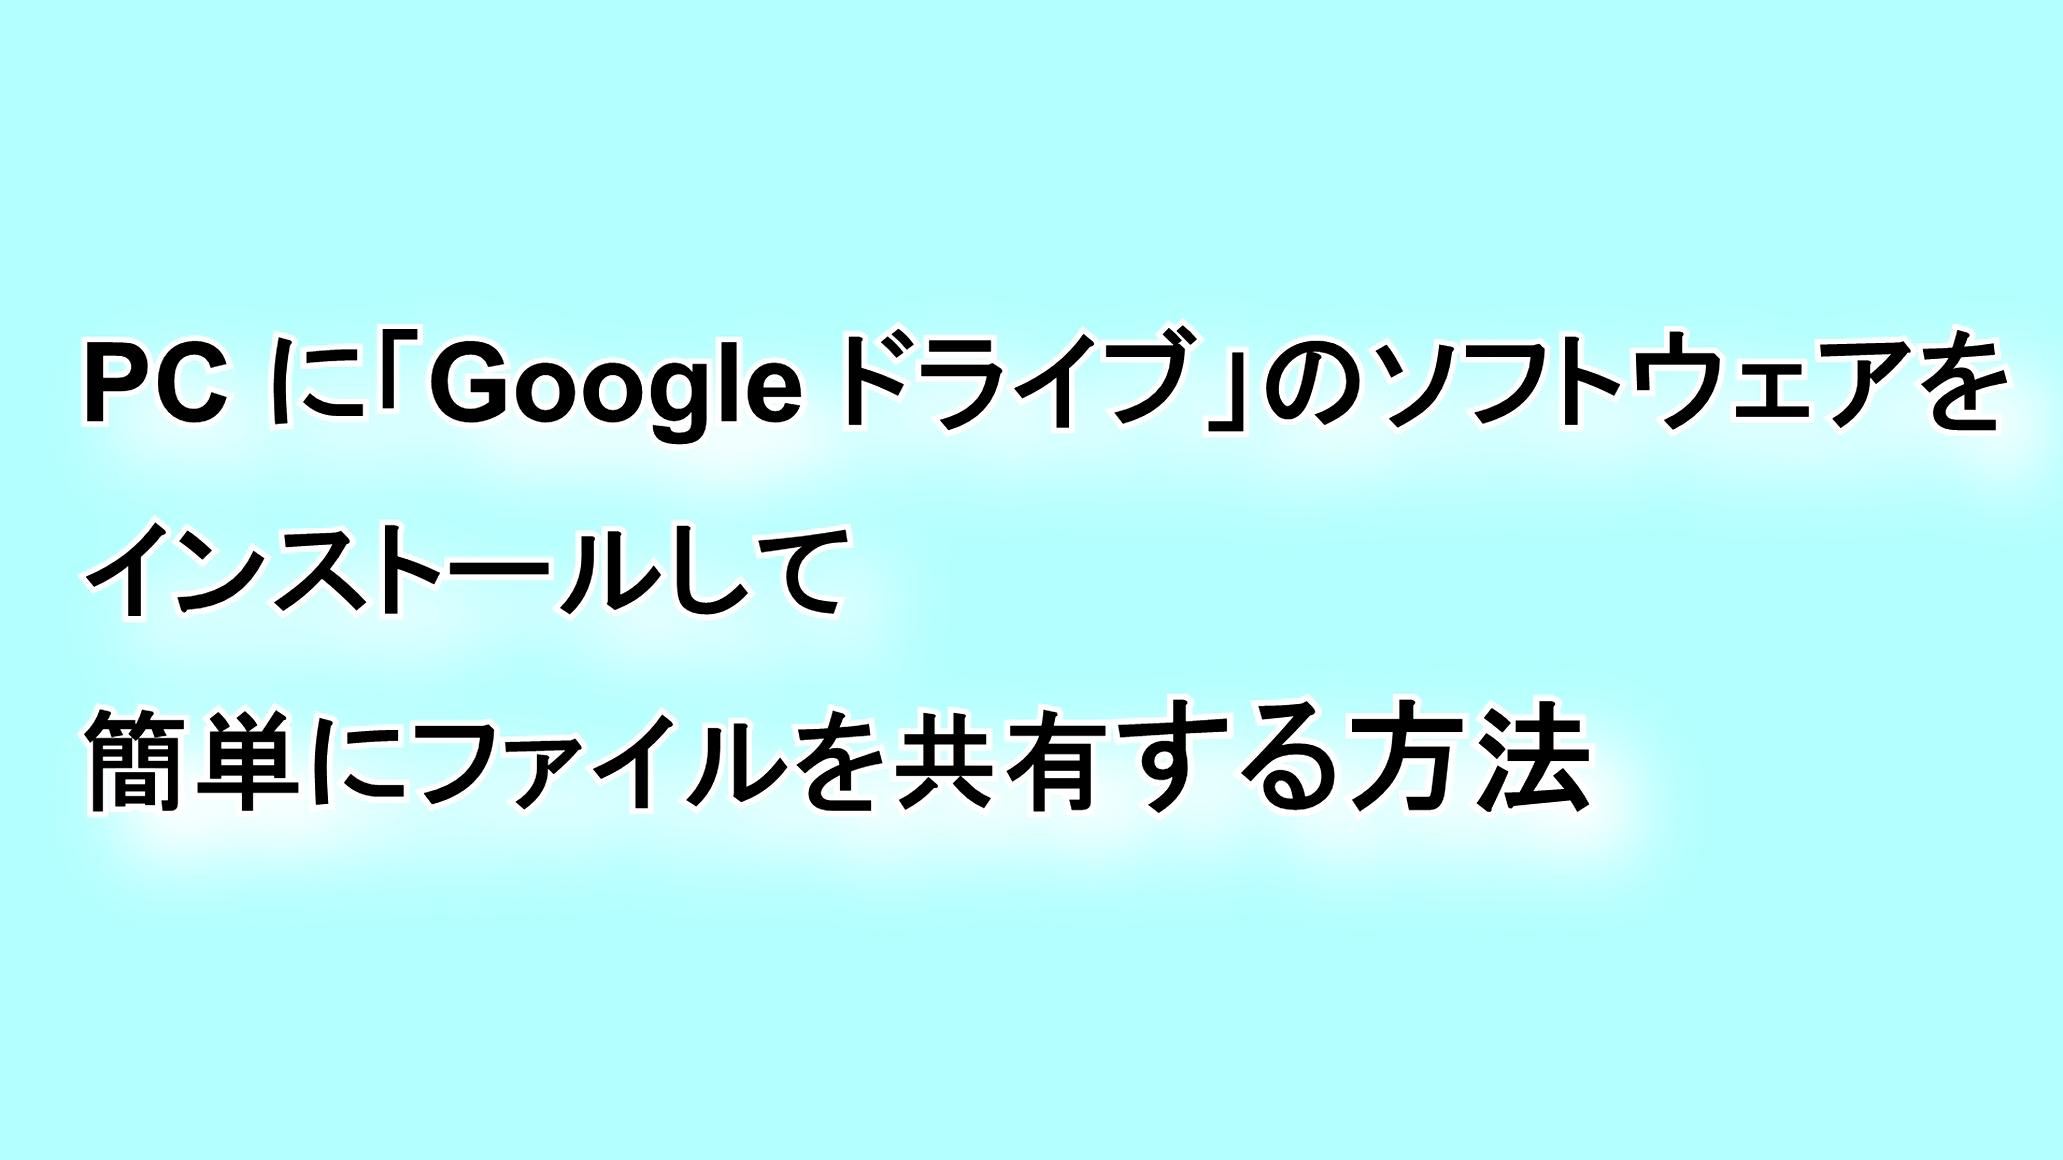 PCに「Google ドライブ」のソフトウェアをインストールして簡単にファイルを共有する方法